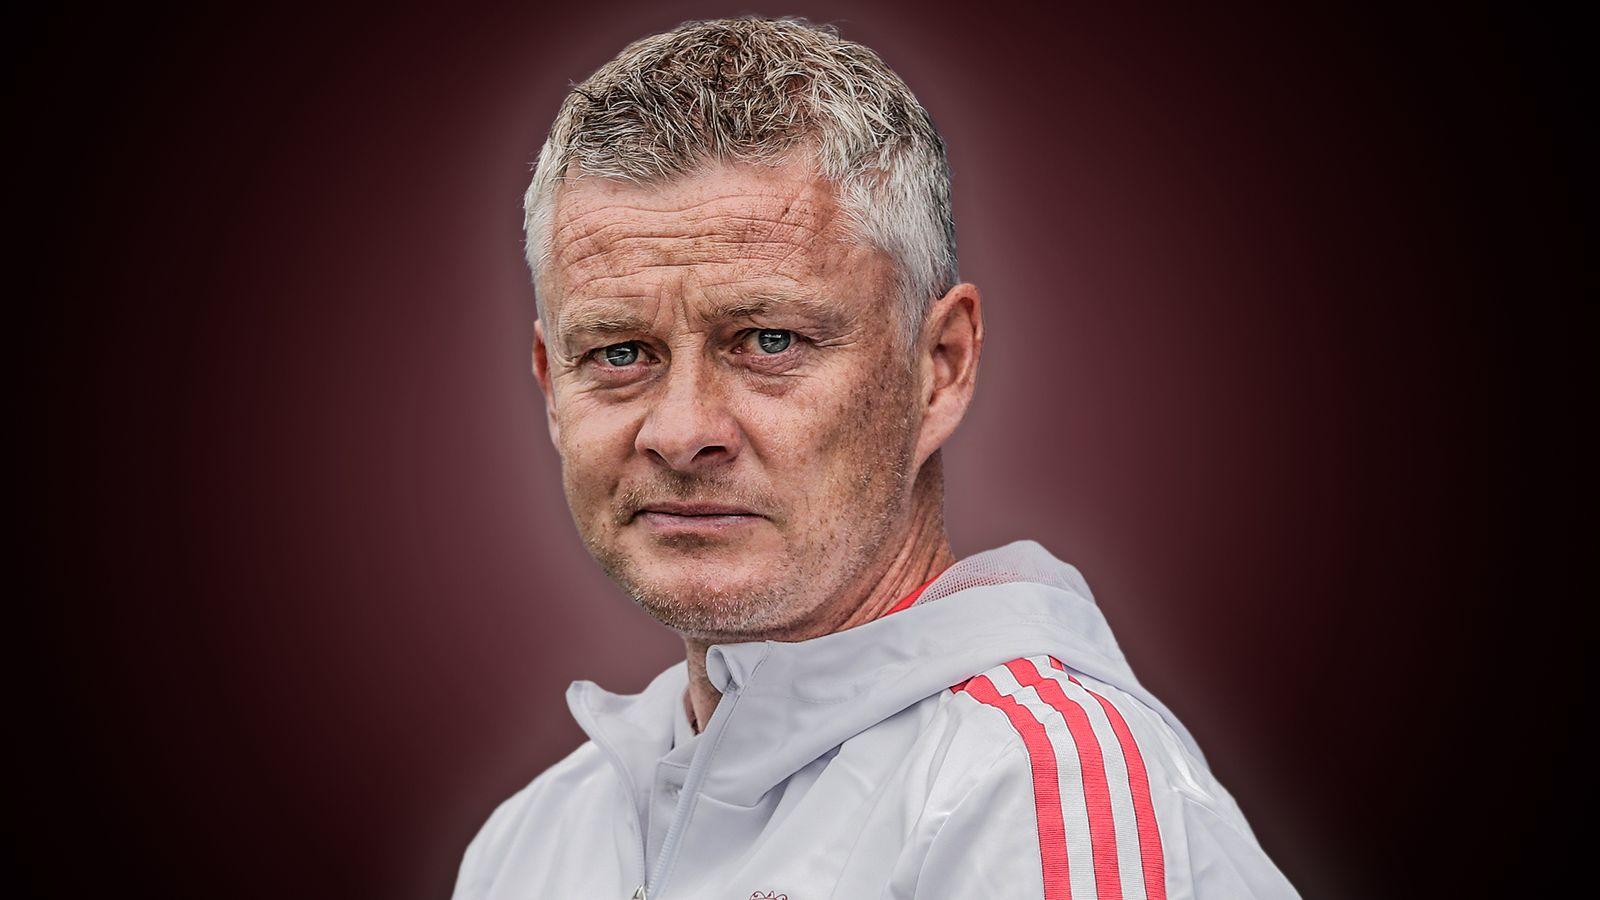 Ole Gunnar Solskjaer: Key questions for Man Utd boss ahead of Tottenham clash